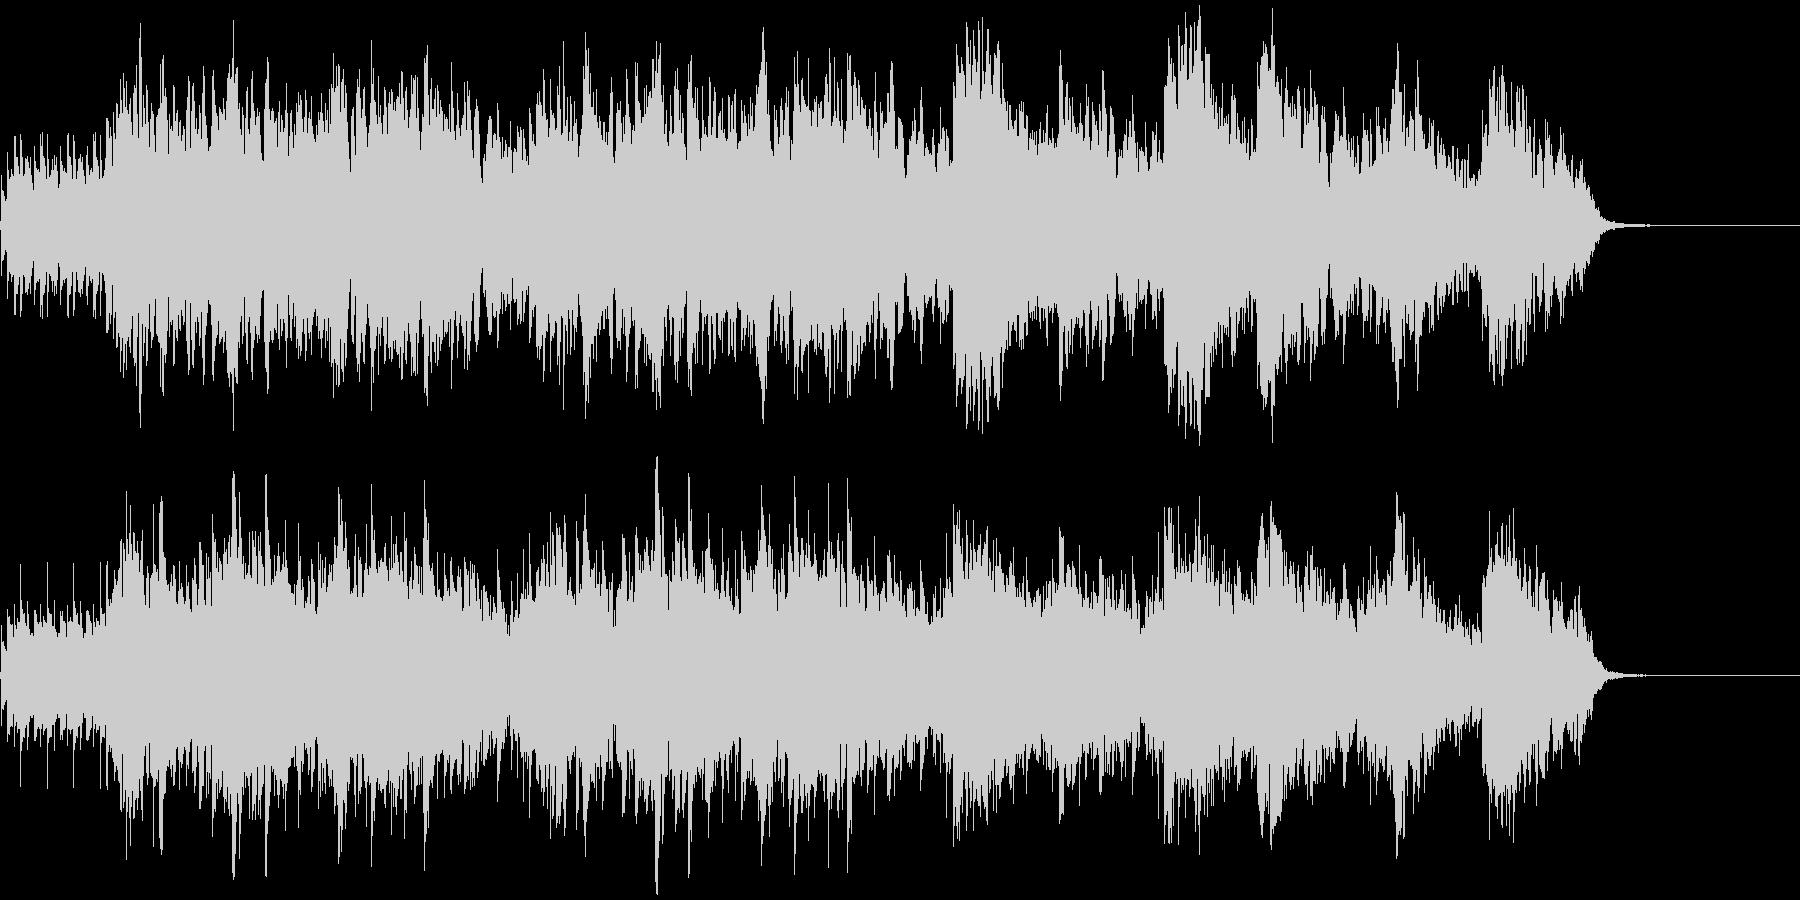 creo_leo_bgm33の未再生の波形